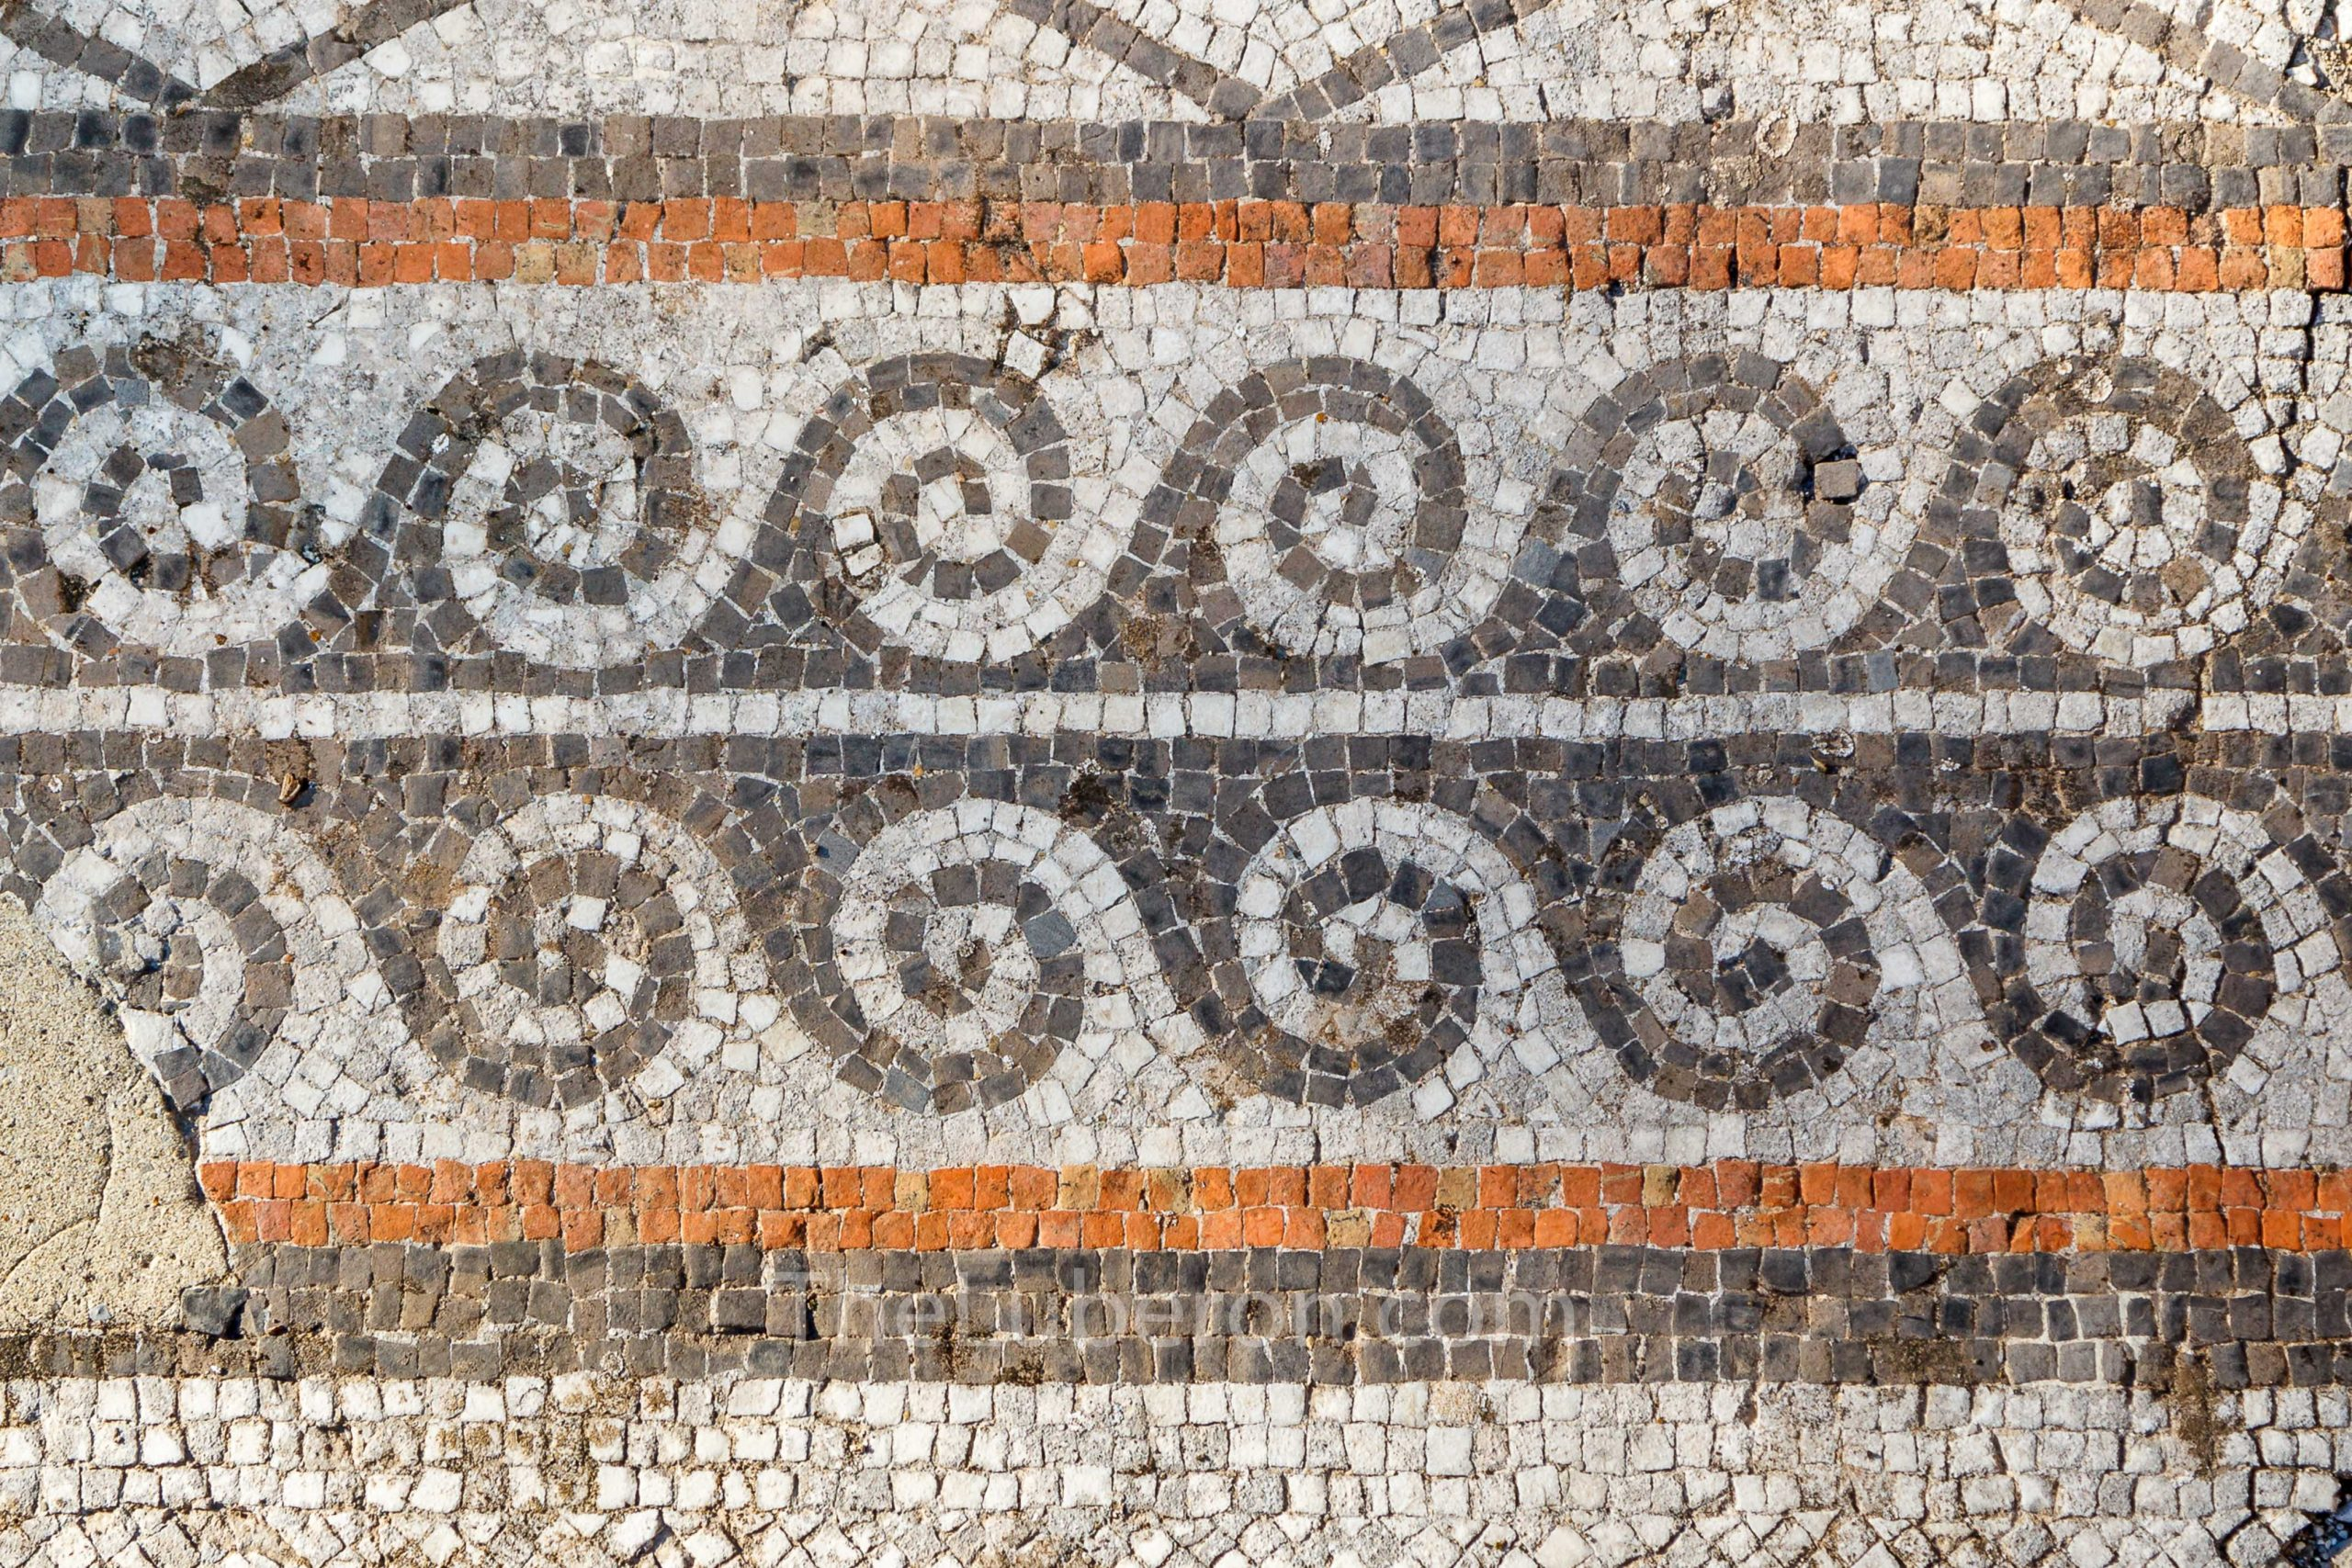 Roman tiles at Vaison-la-Romaine